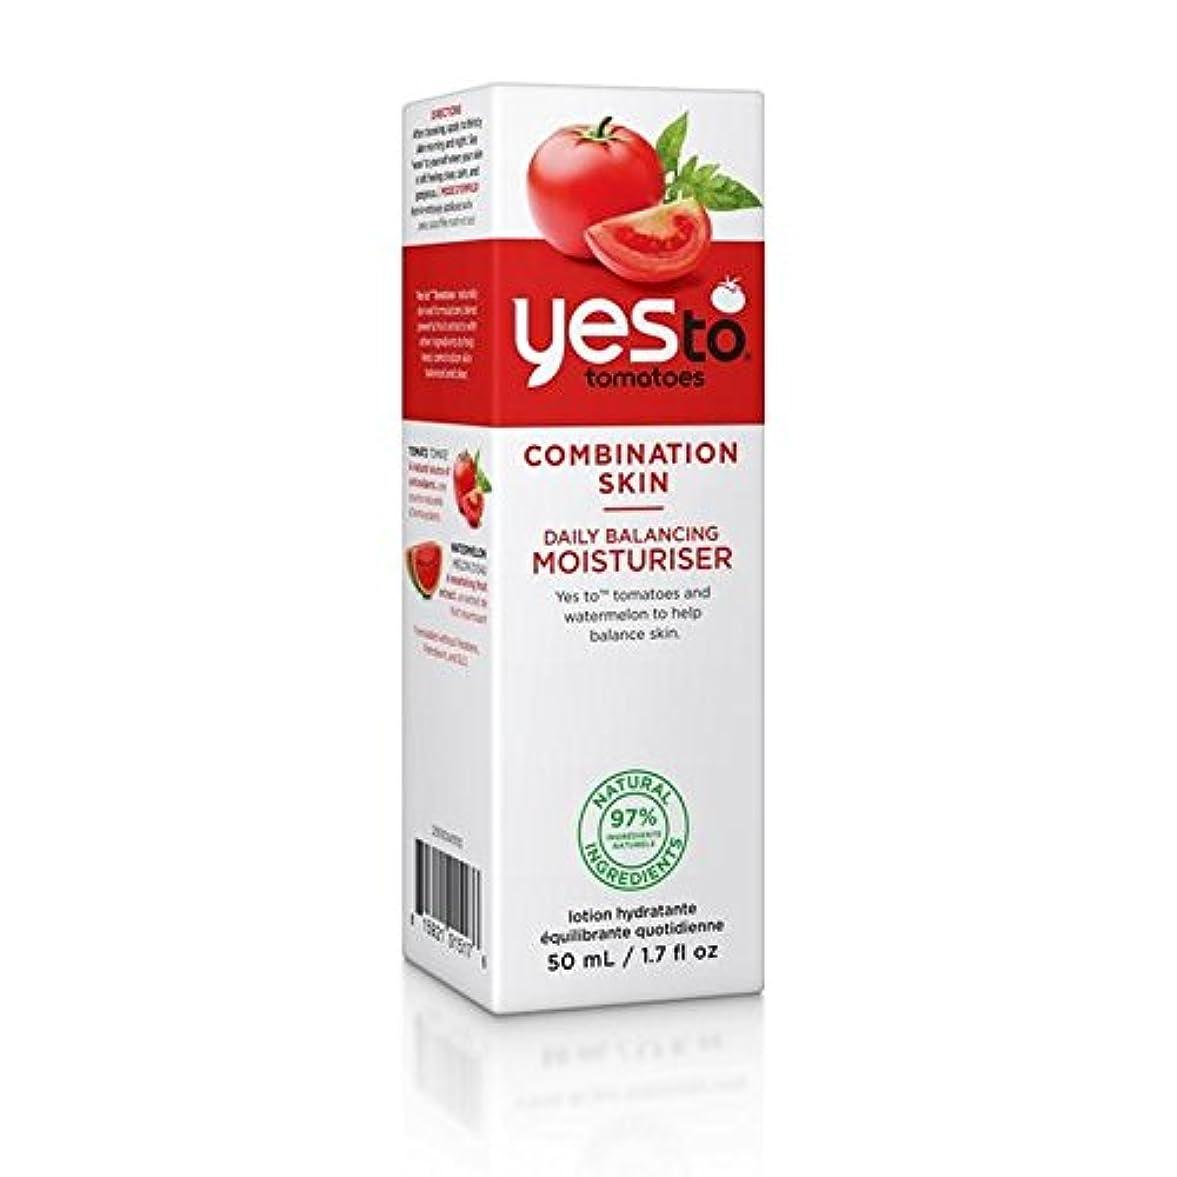 Yes to Tomatoes Moisturiser 50ml (Pack of 6) - はいトマトに保湿50ミリリットル x6 [並行輸入品]